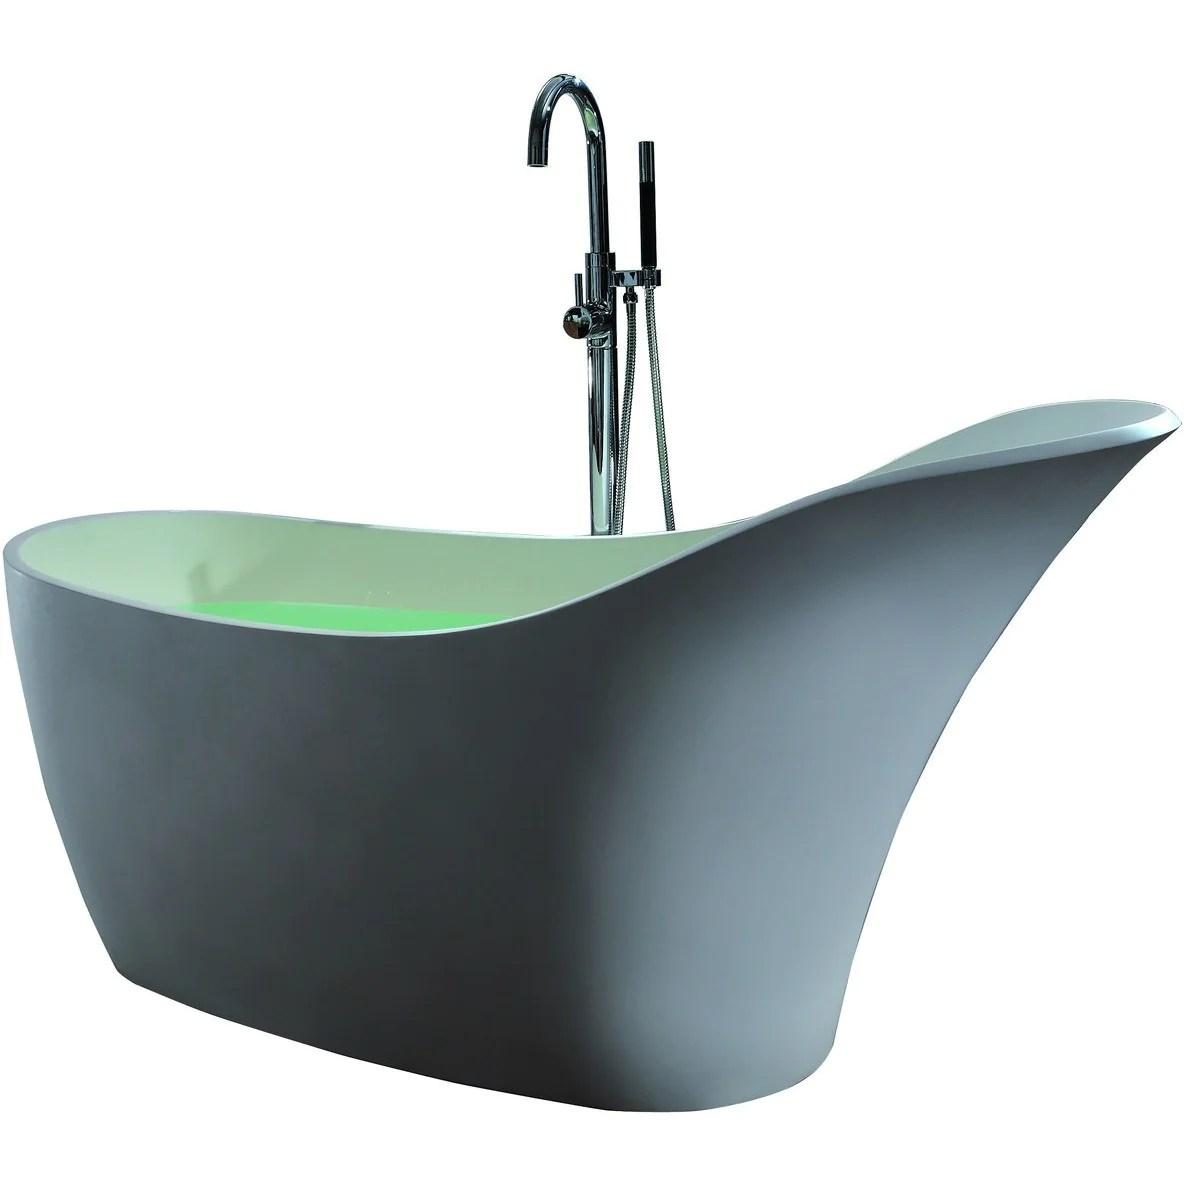 Cheap Freestanding Tub  acidproof